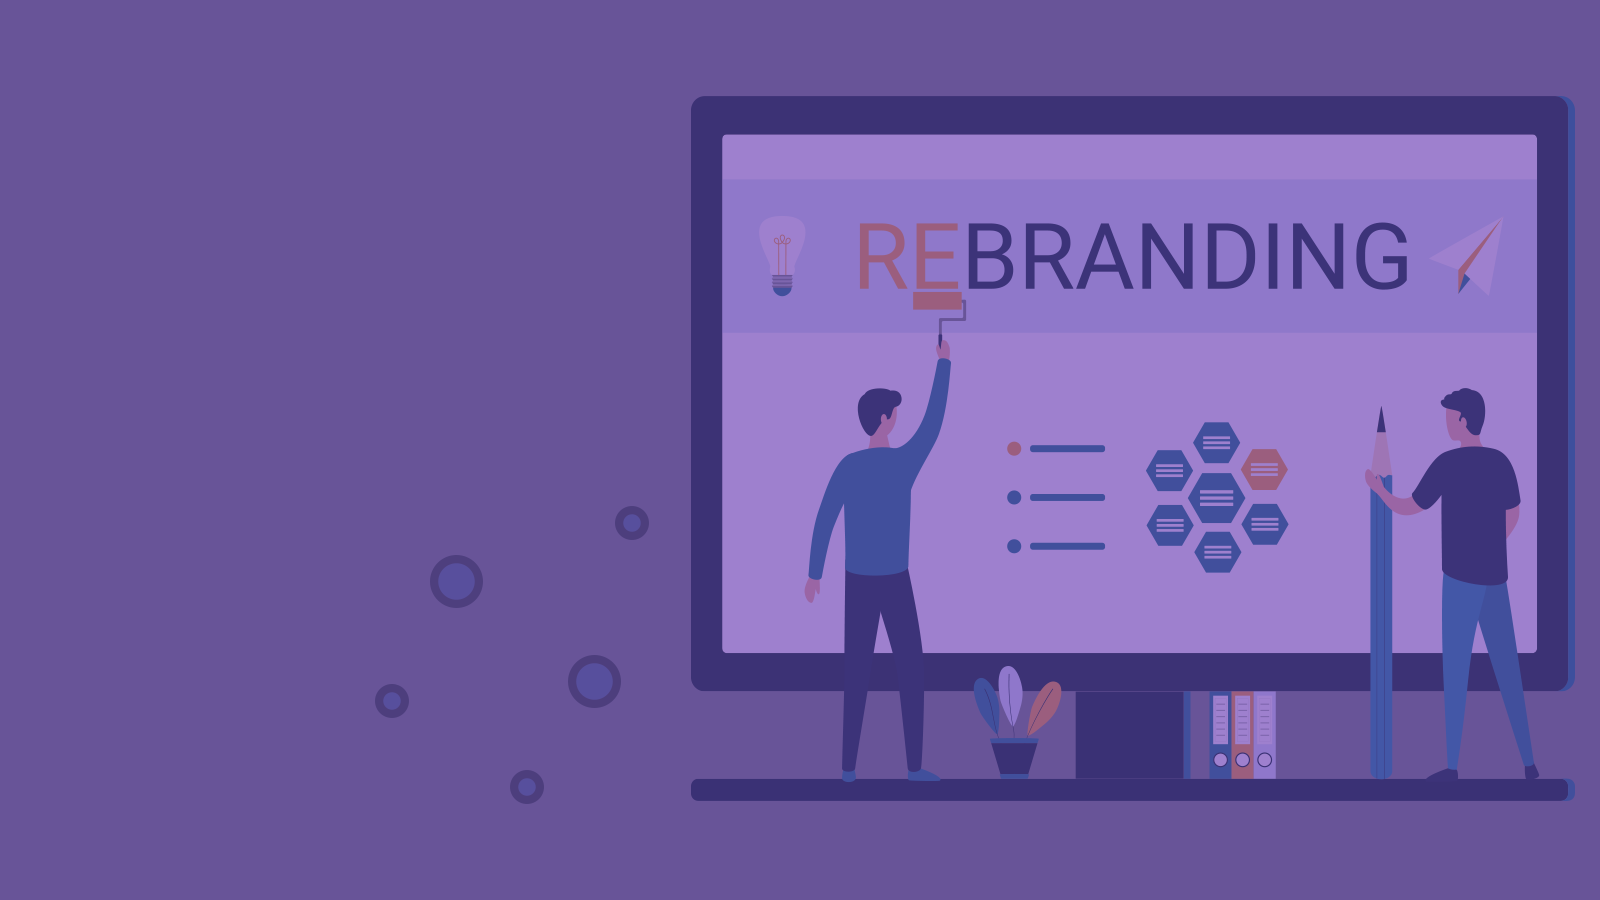 RebrandingHeader